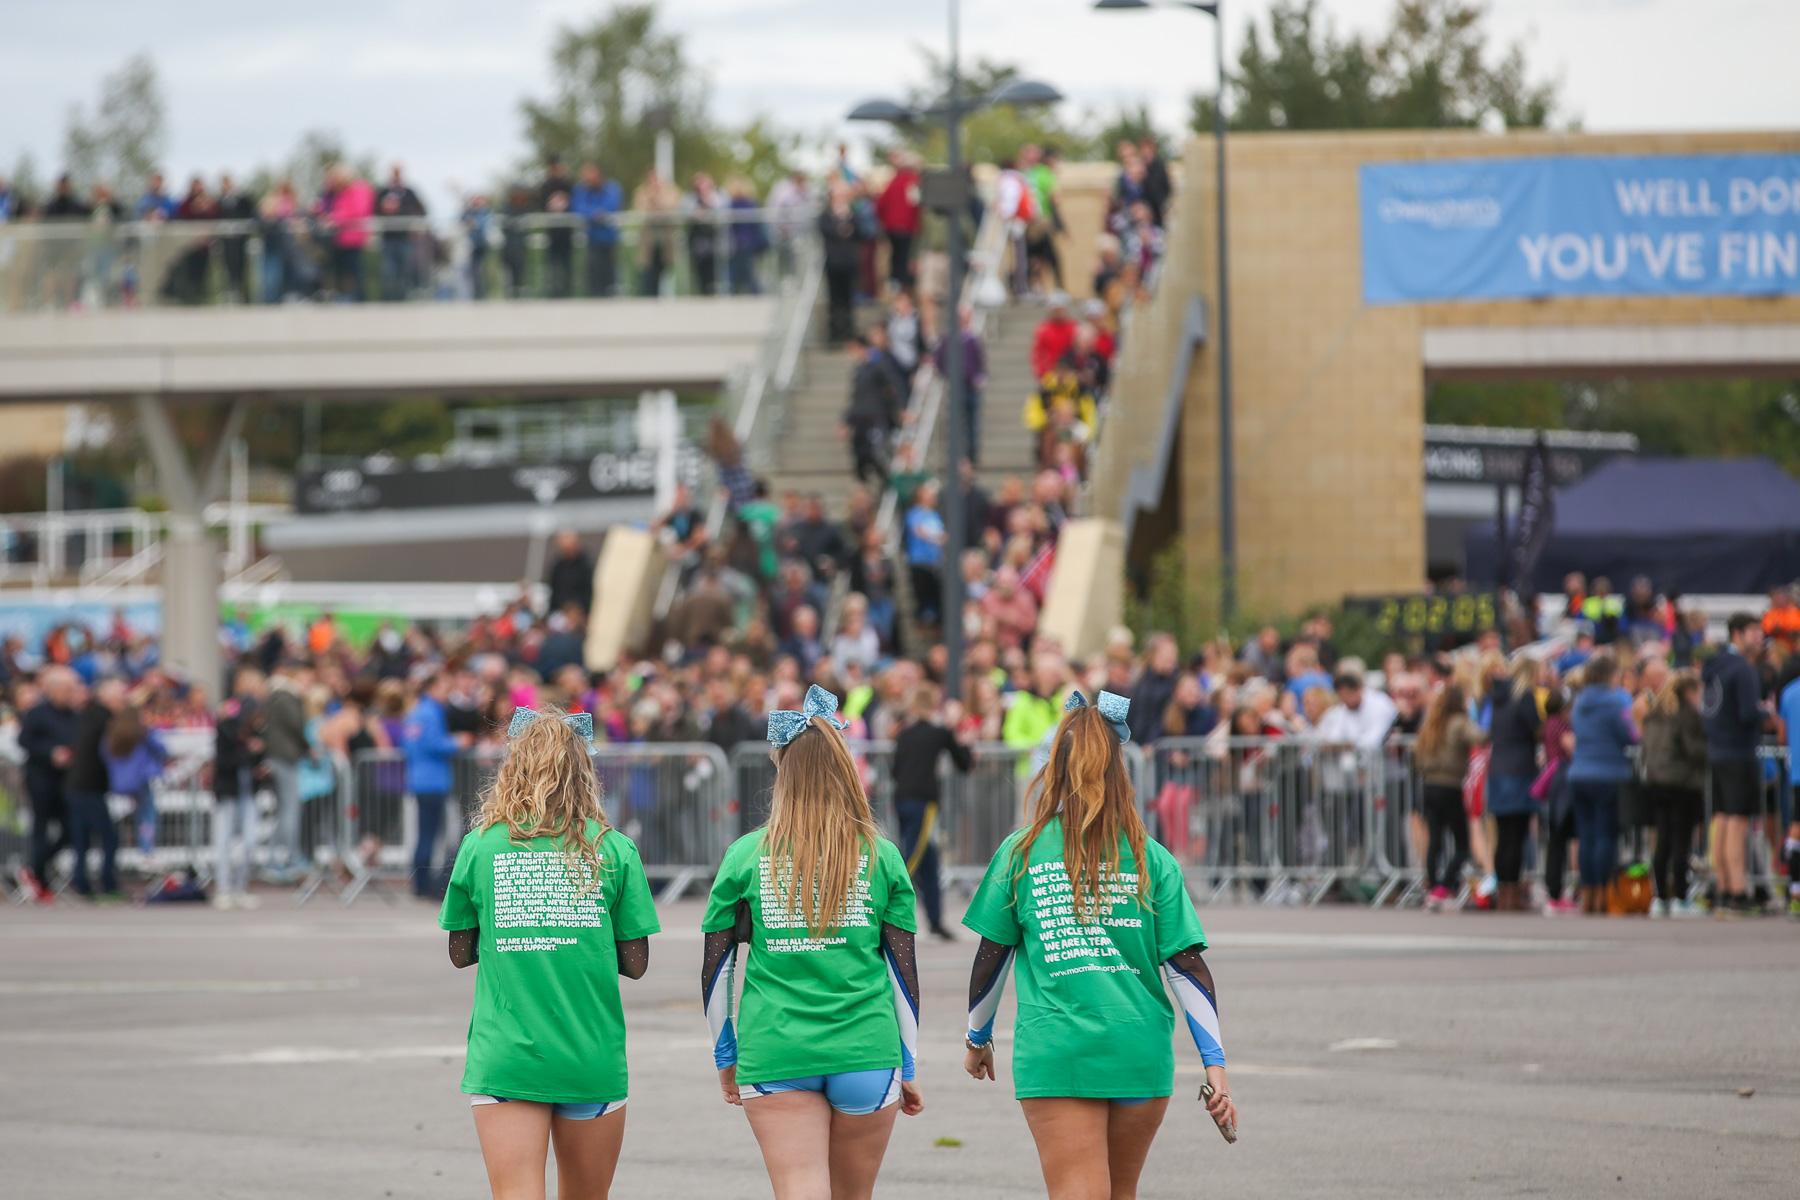 Macmillan-charity-marathon-run-cheltenham-racecourse-september-2018-natalia-smith-photography0264.jpg